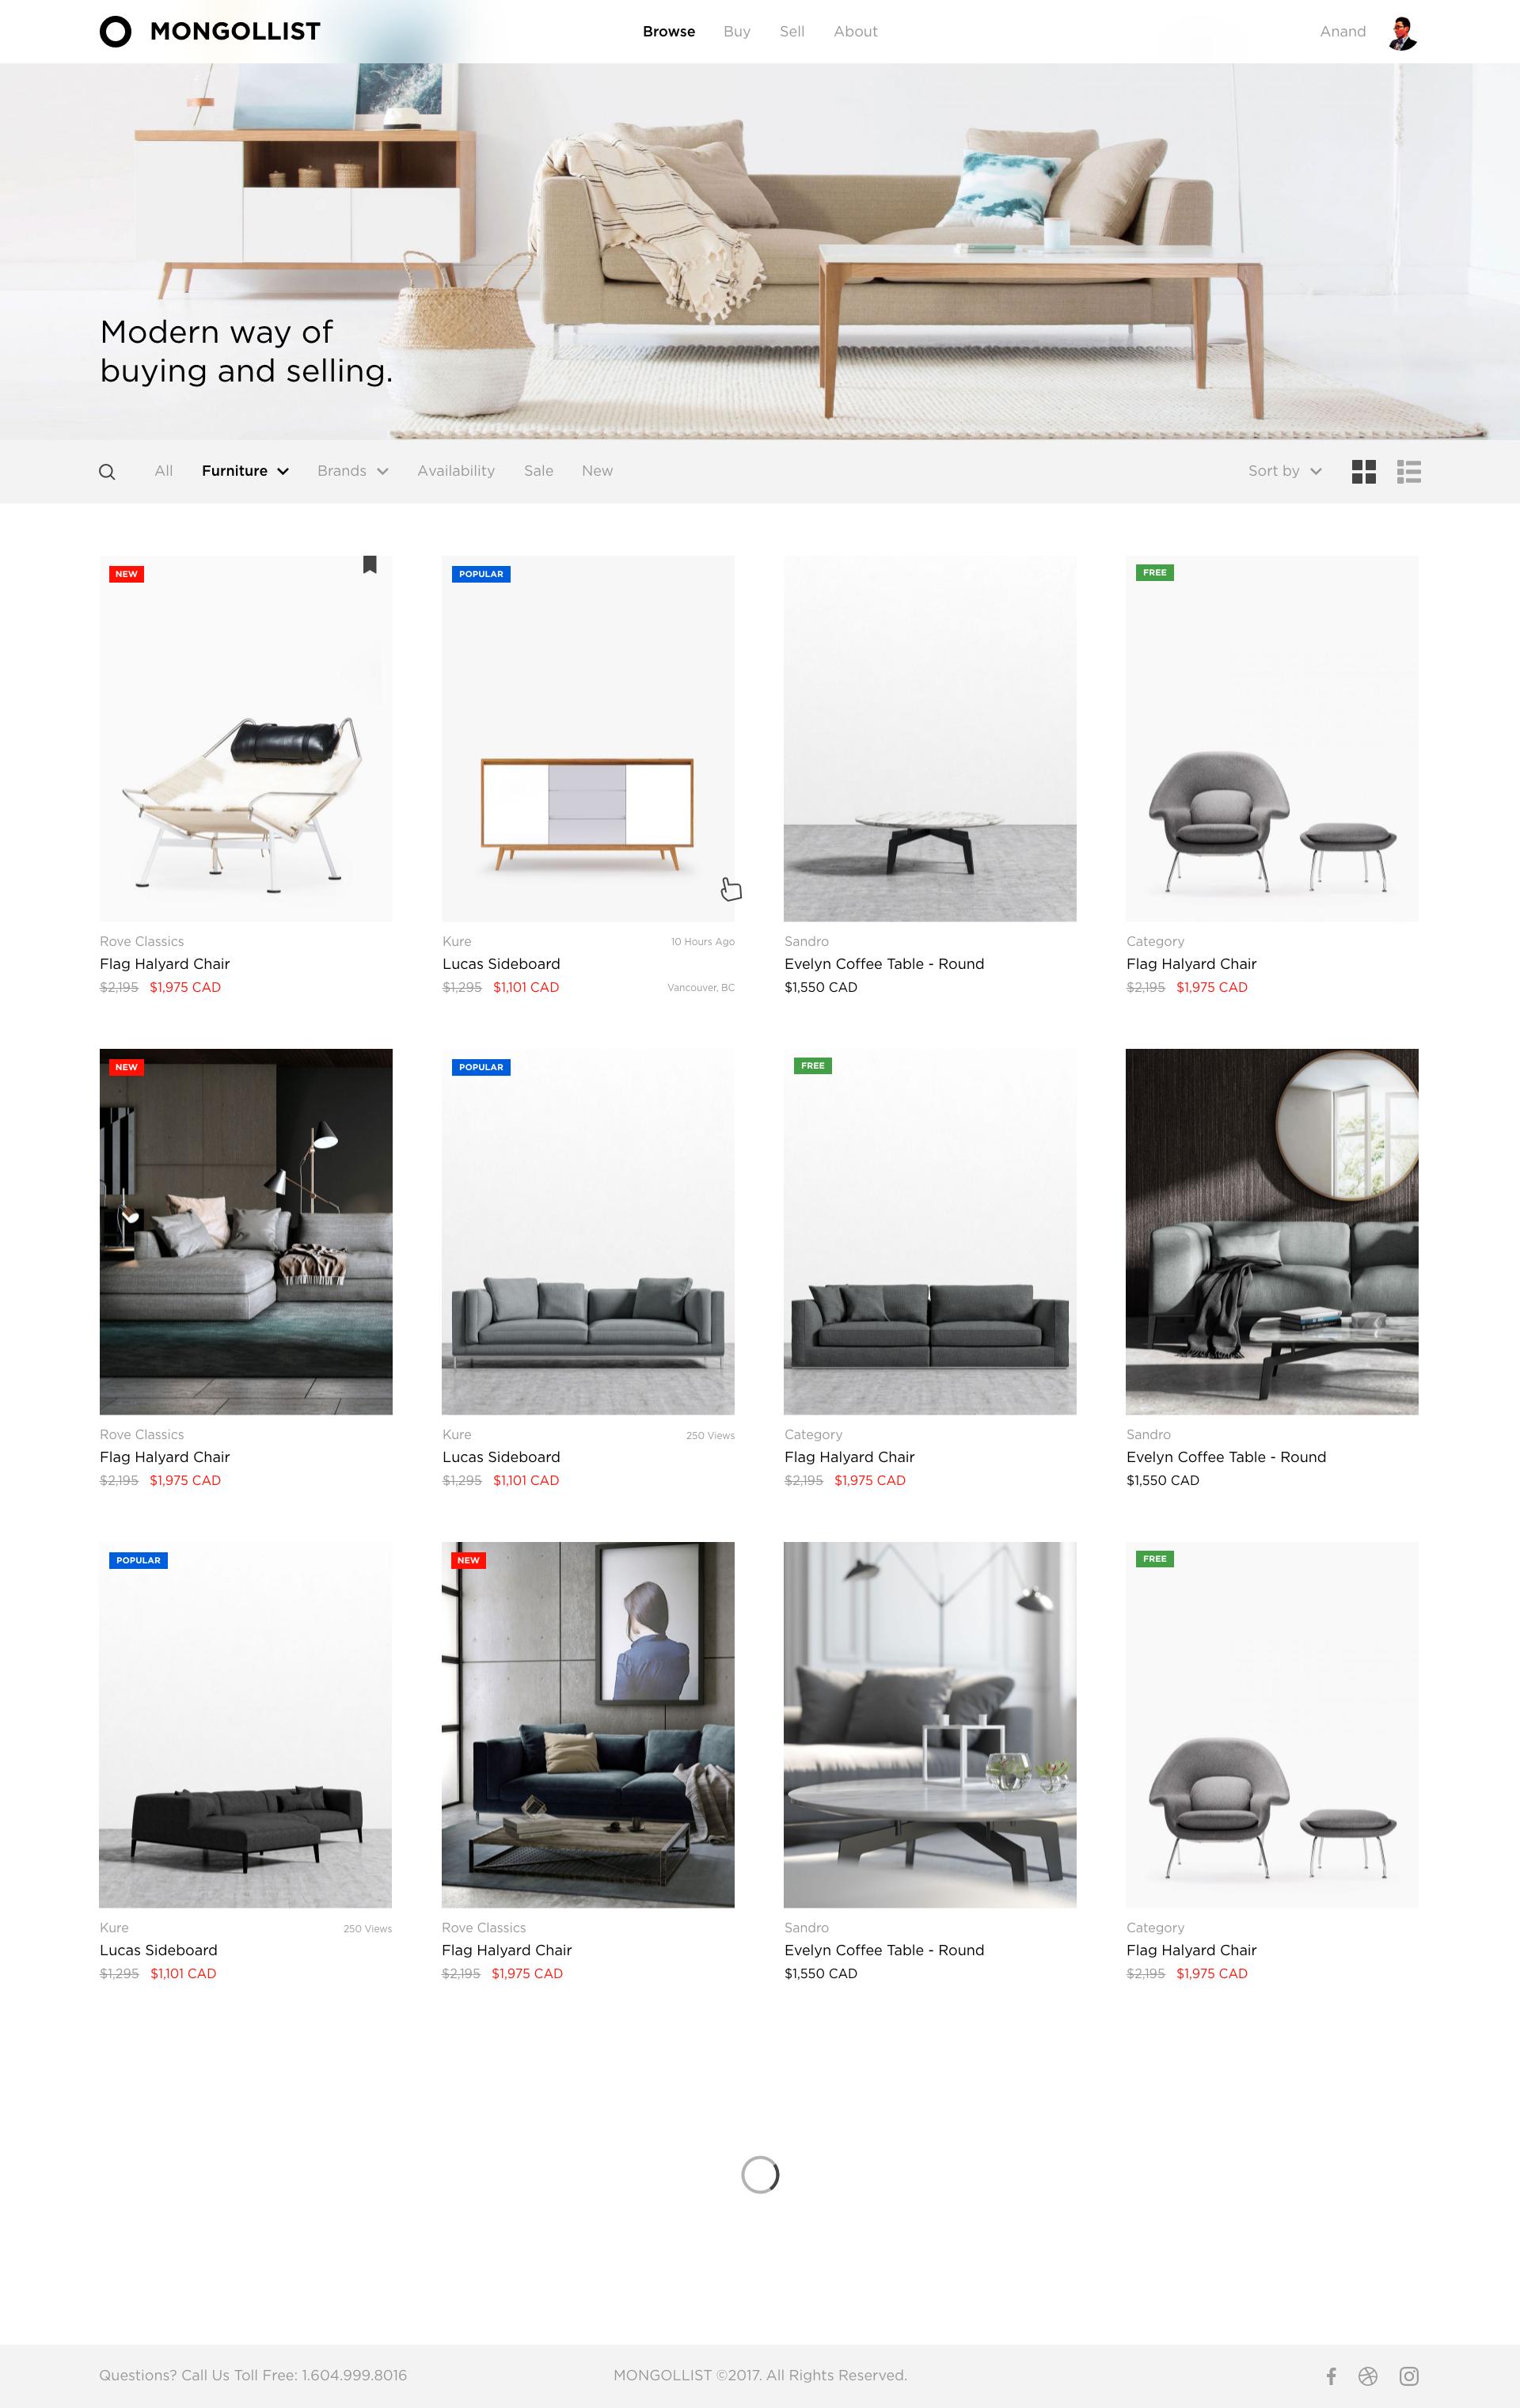 Mongollist Web Design